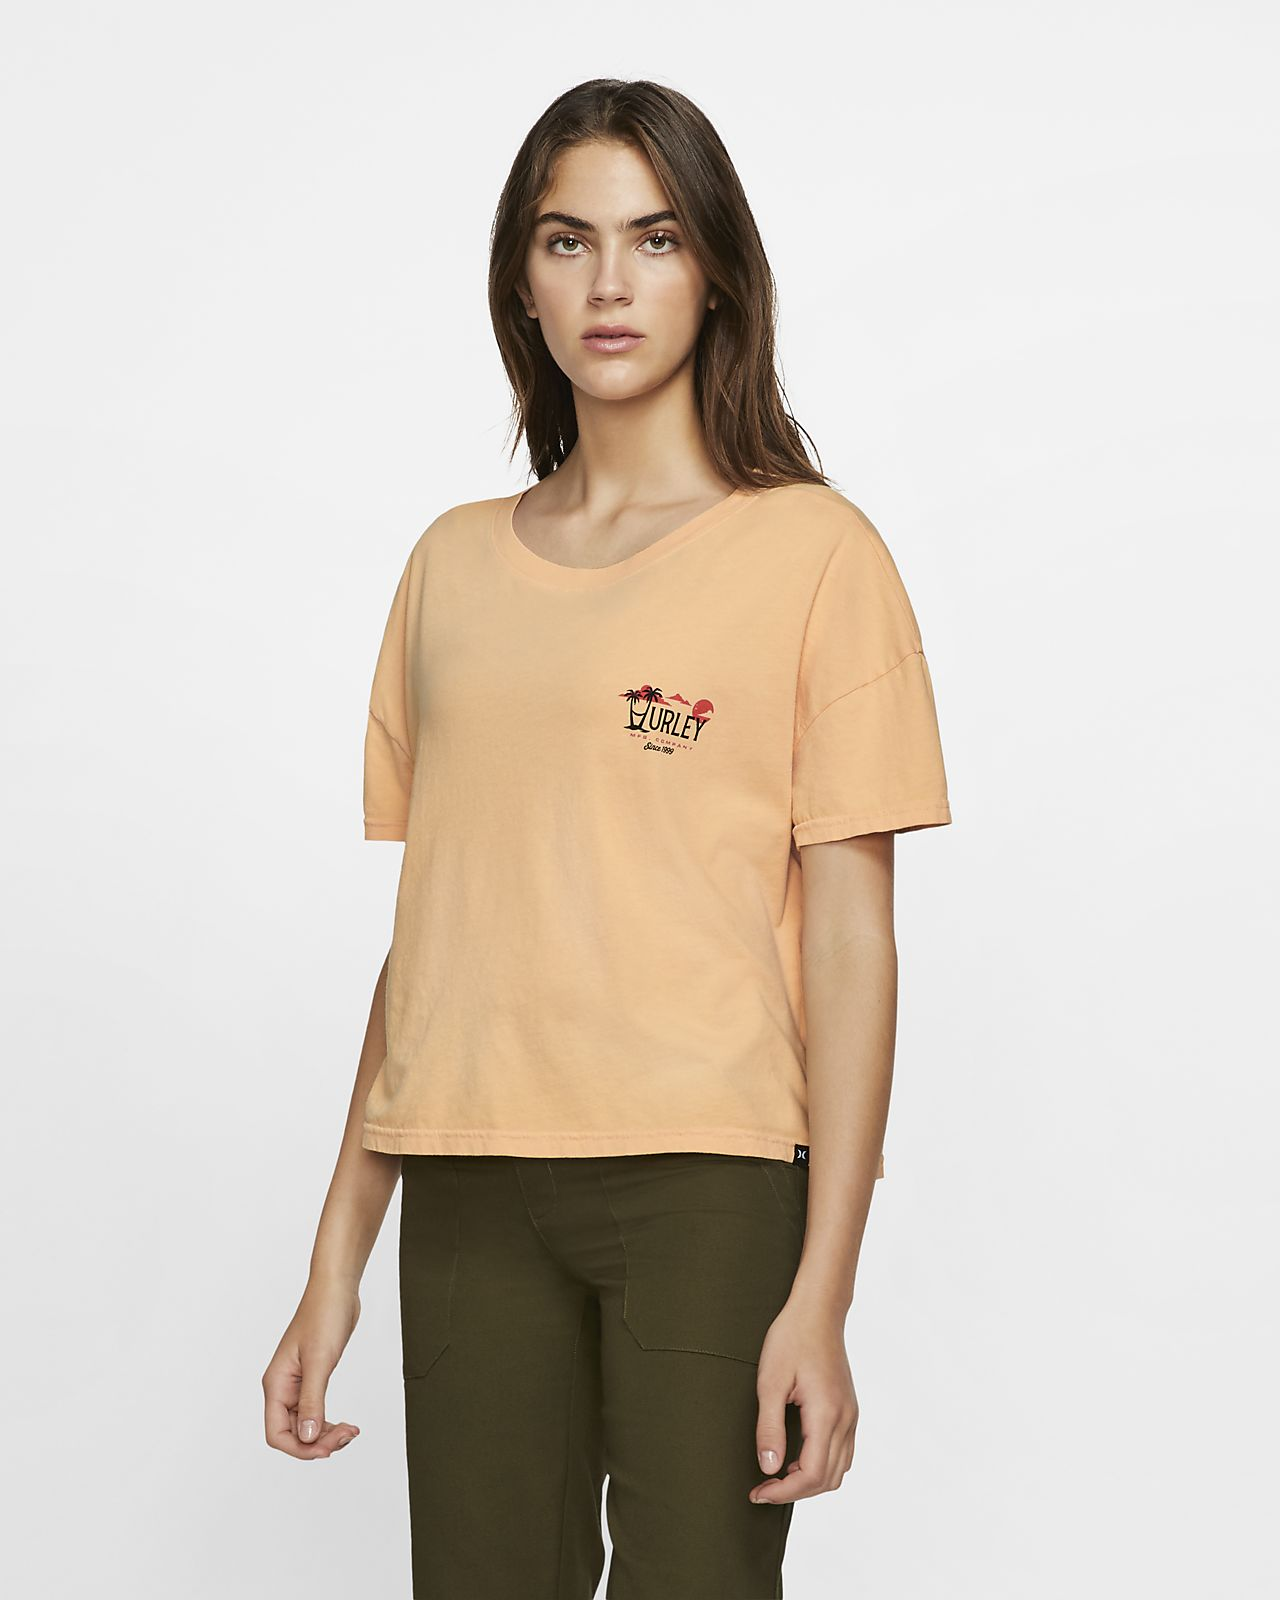 Hurley Mirari Flouncy Women's T-Shirt